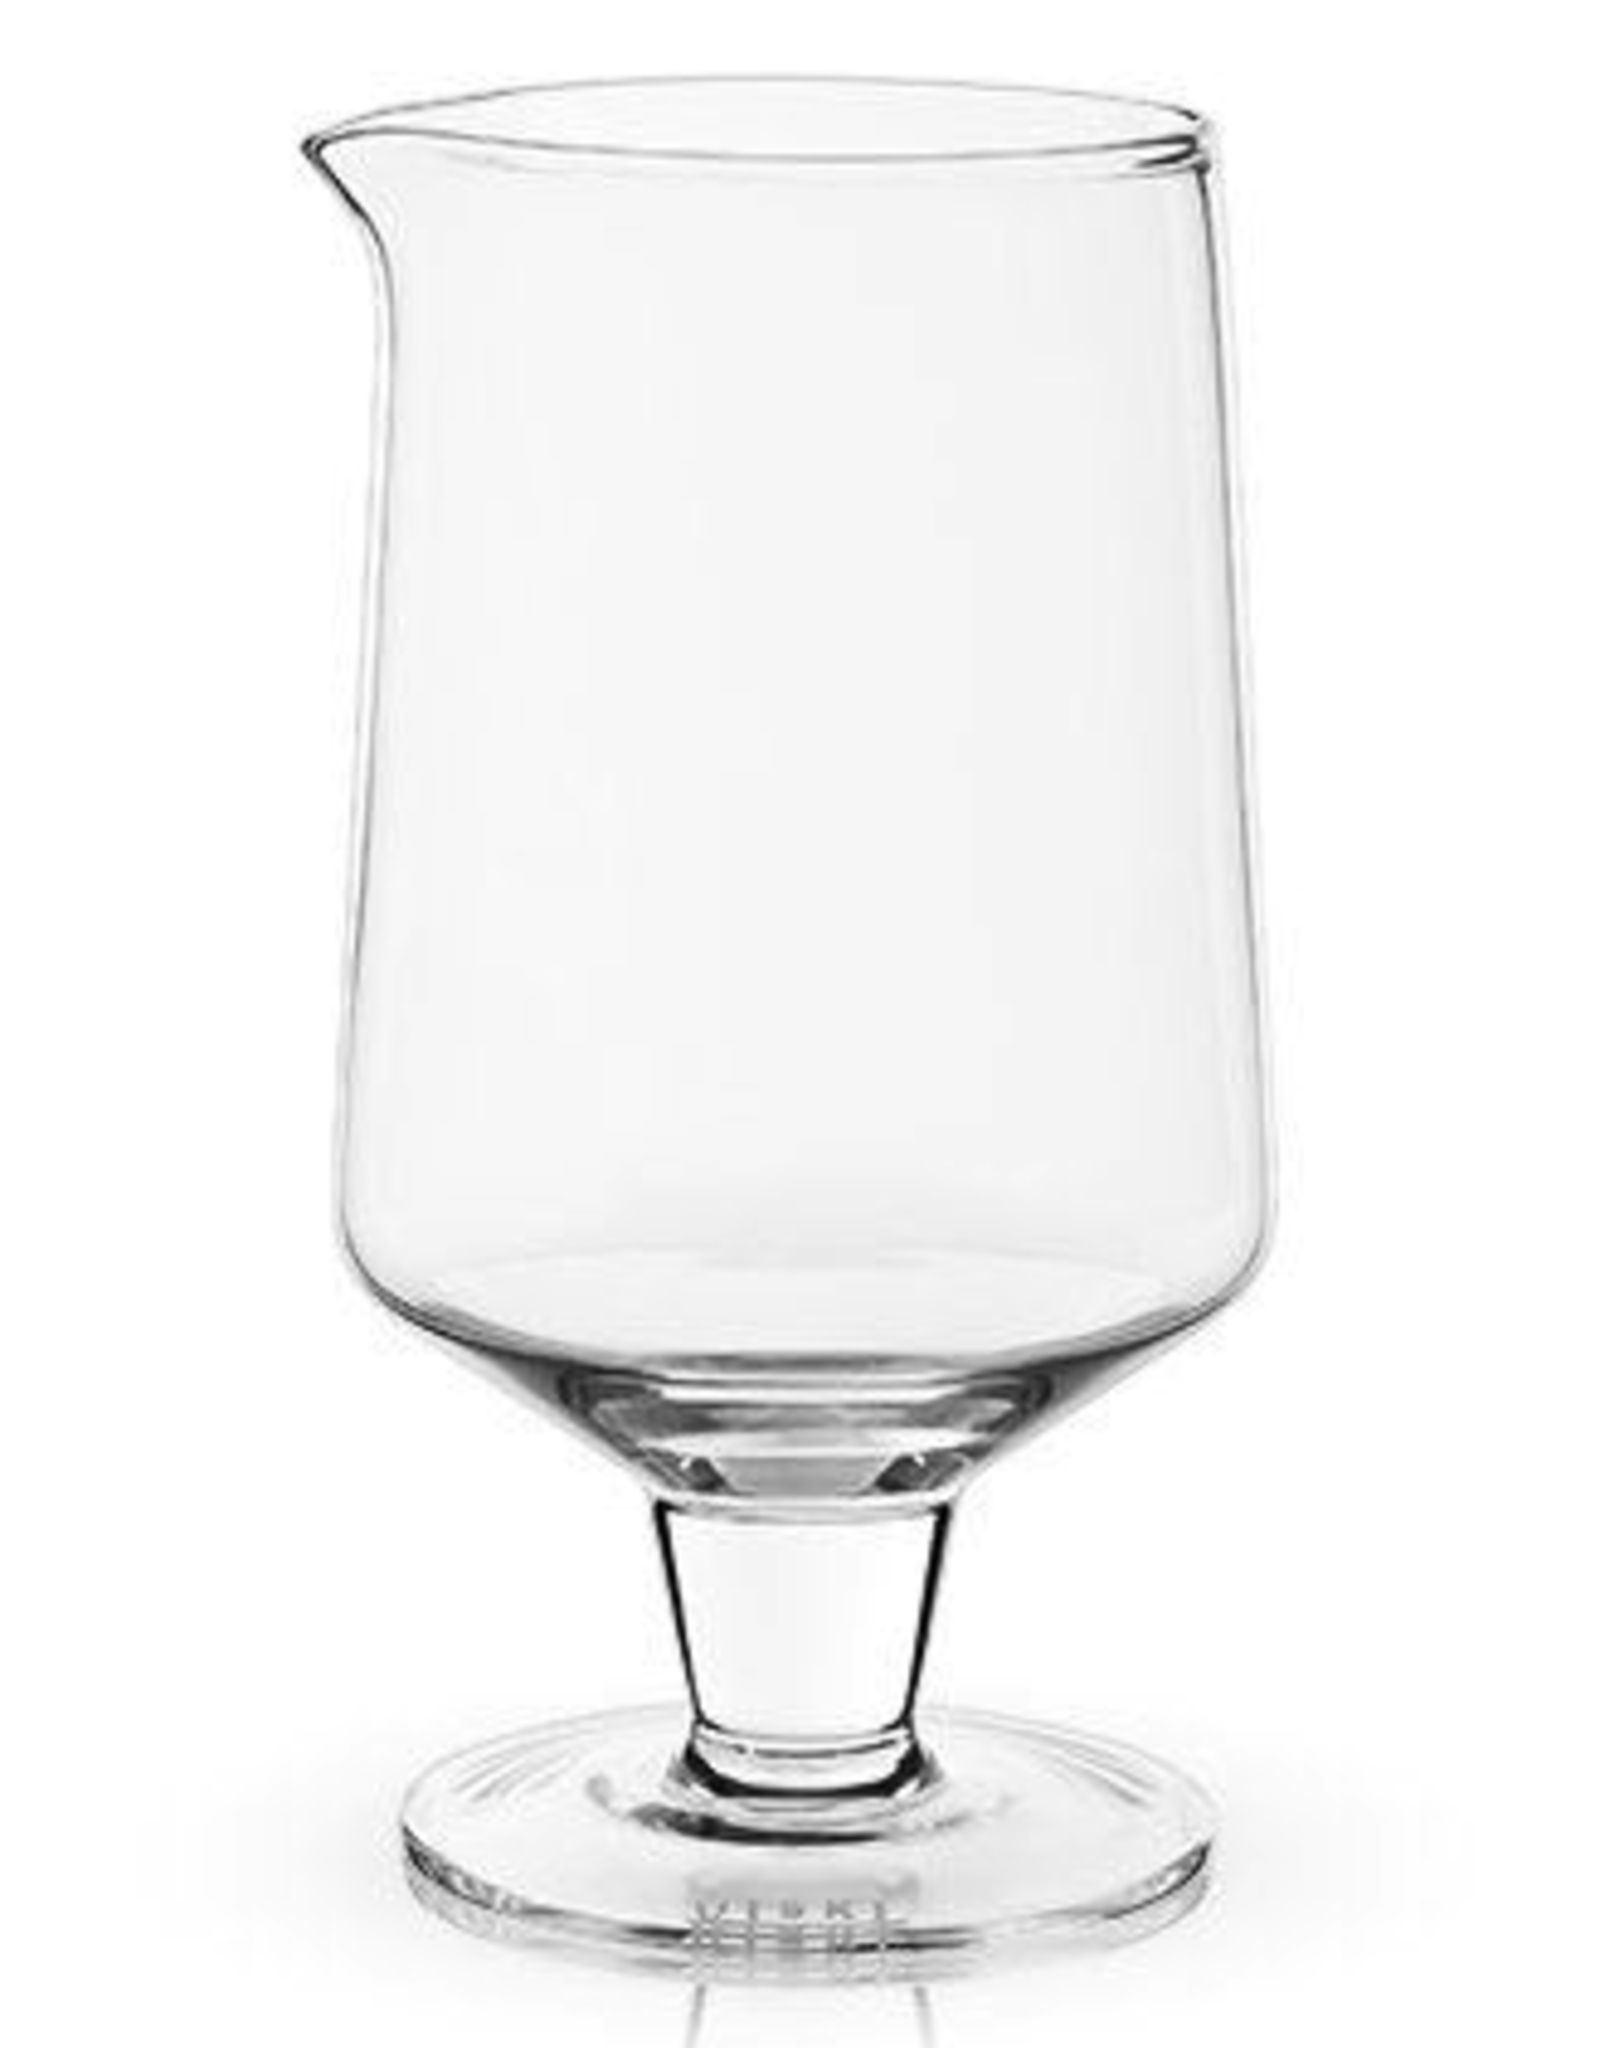 Mixing Glass, Stemmed, Crystal, by Visky